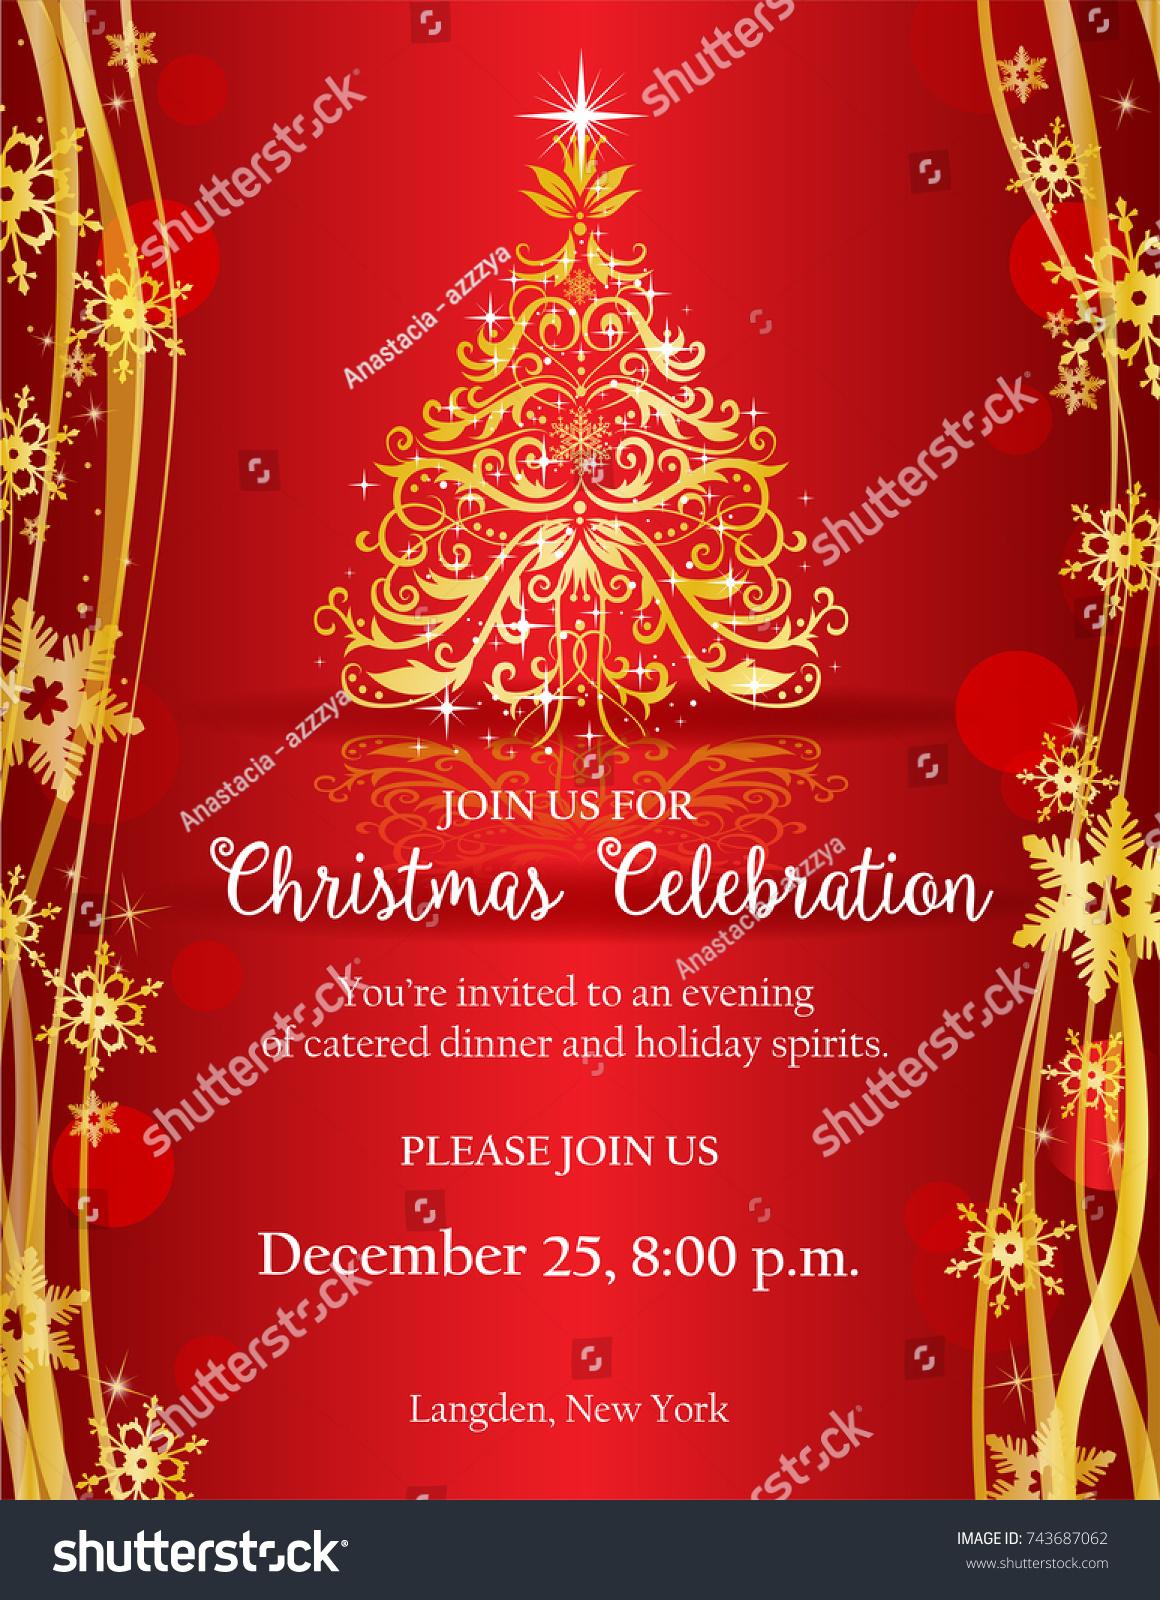 Christmas Party Invitation Ornate Golden Christmas Stock Vector